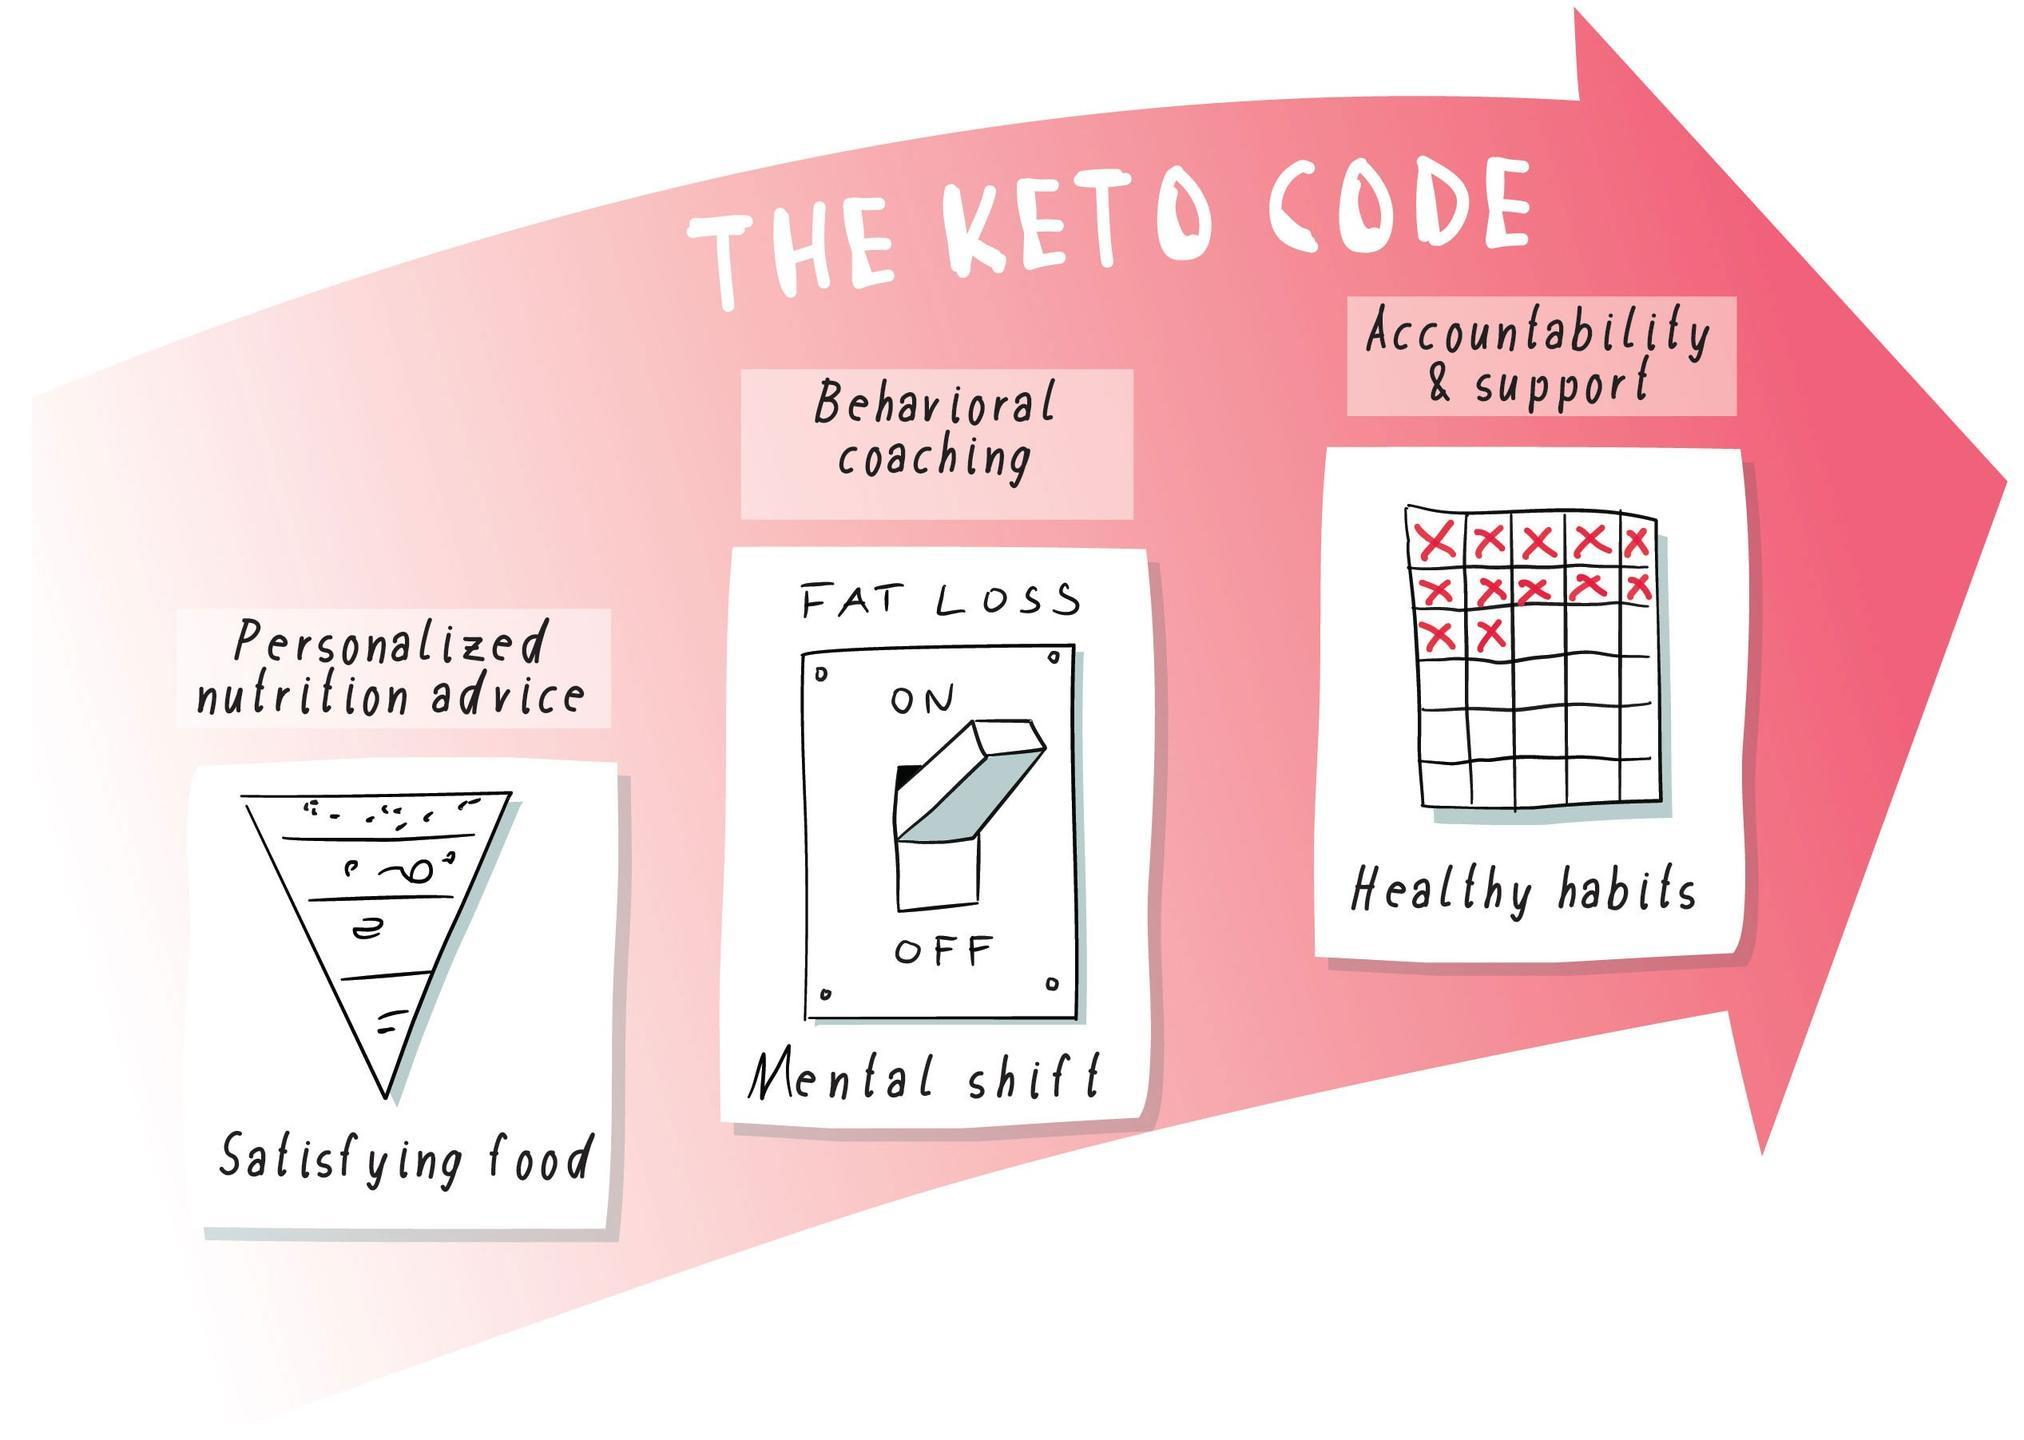 The Keto Code